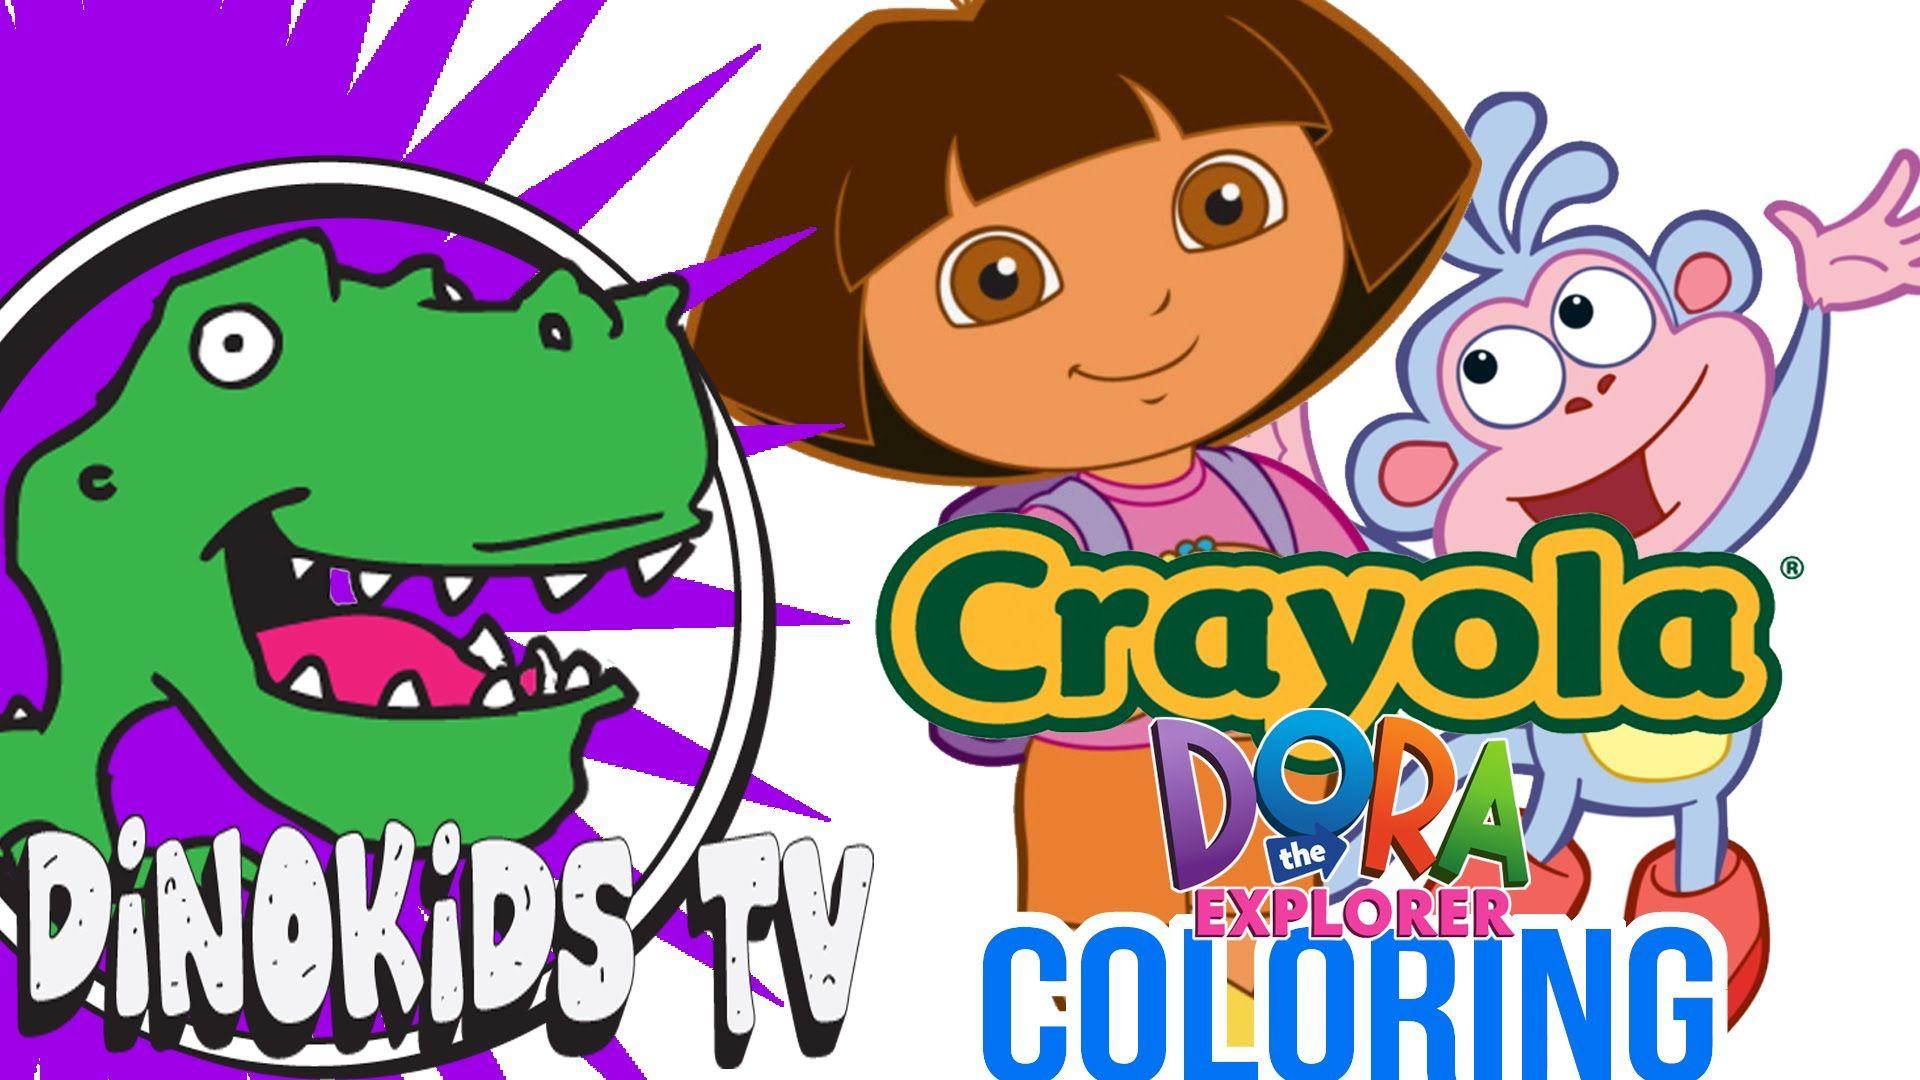 DORA THE EXPLORER - CRAYOLA COLORING BOOK BOOTS - DINO KIDS TV ...